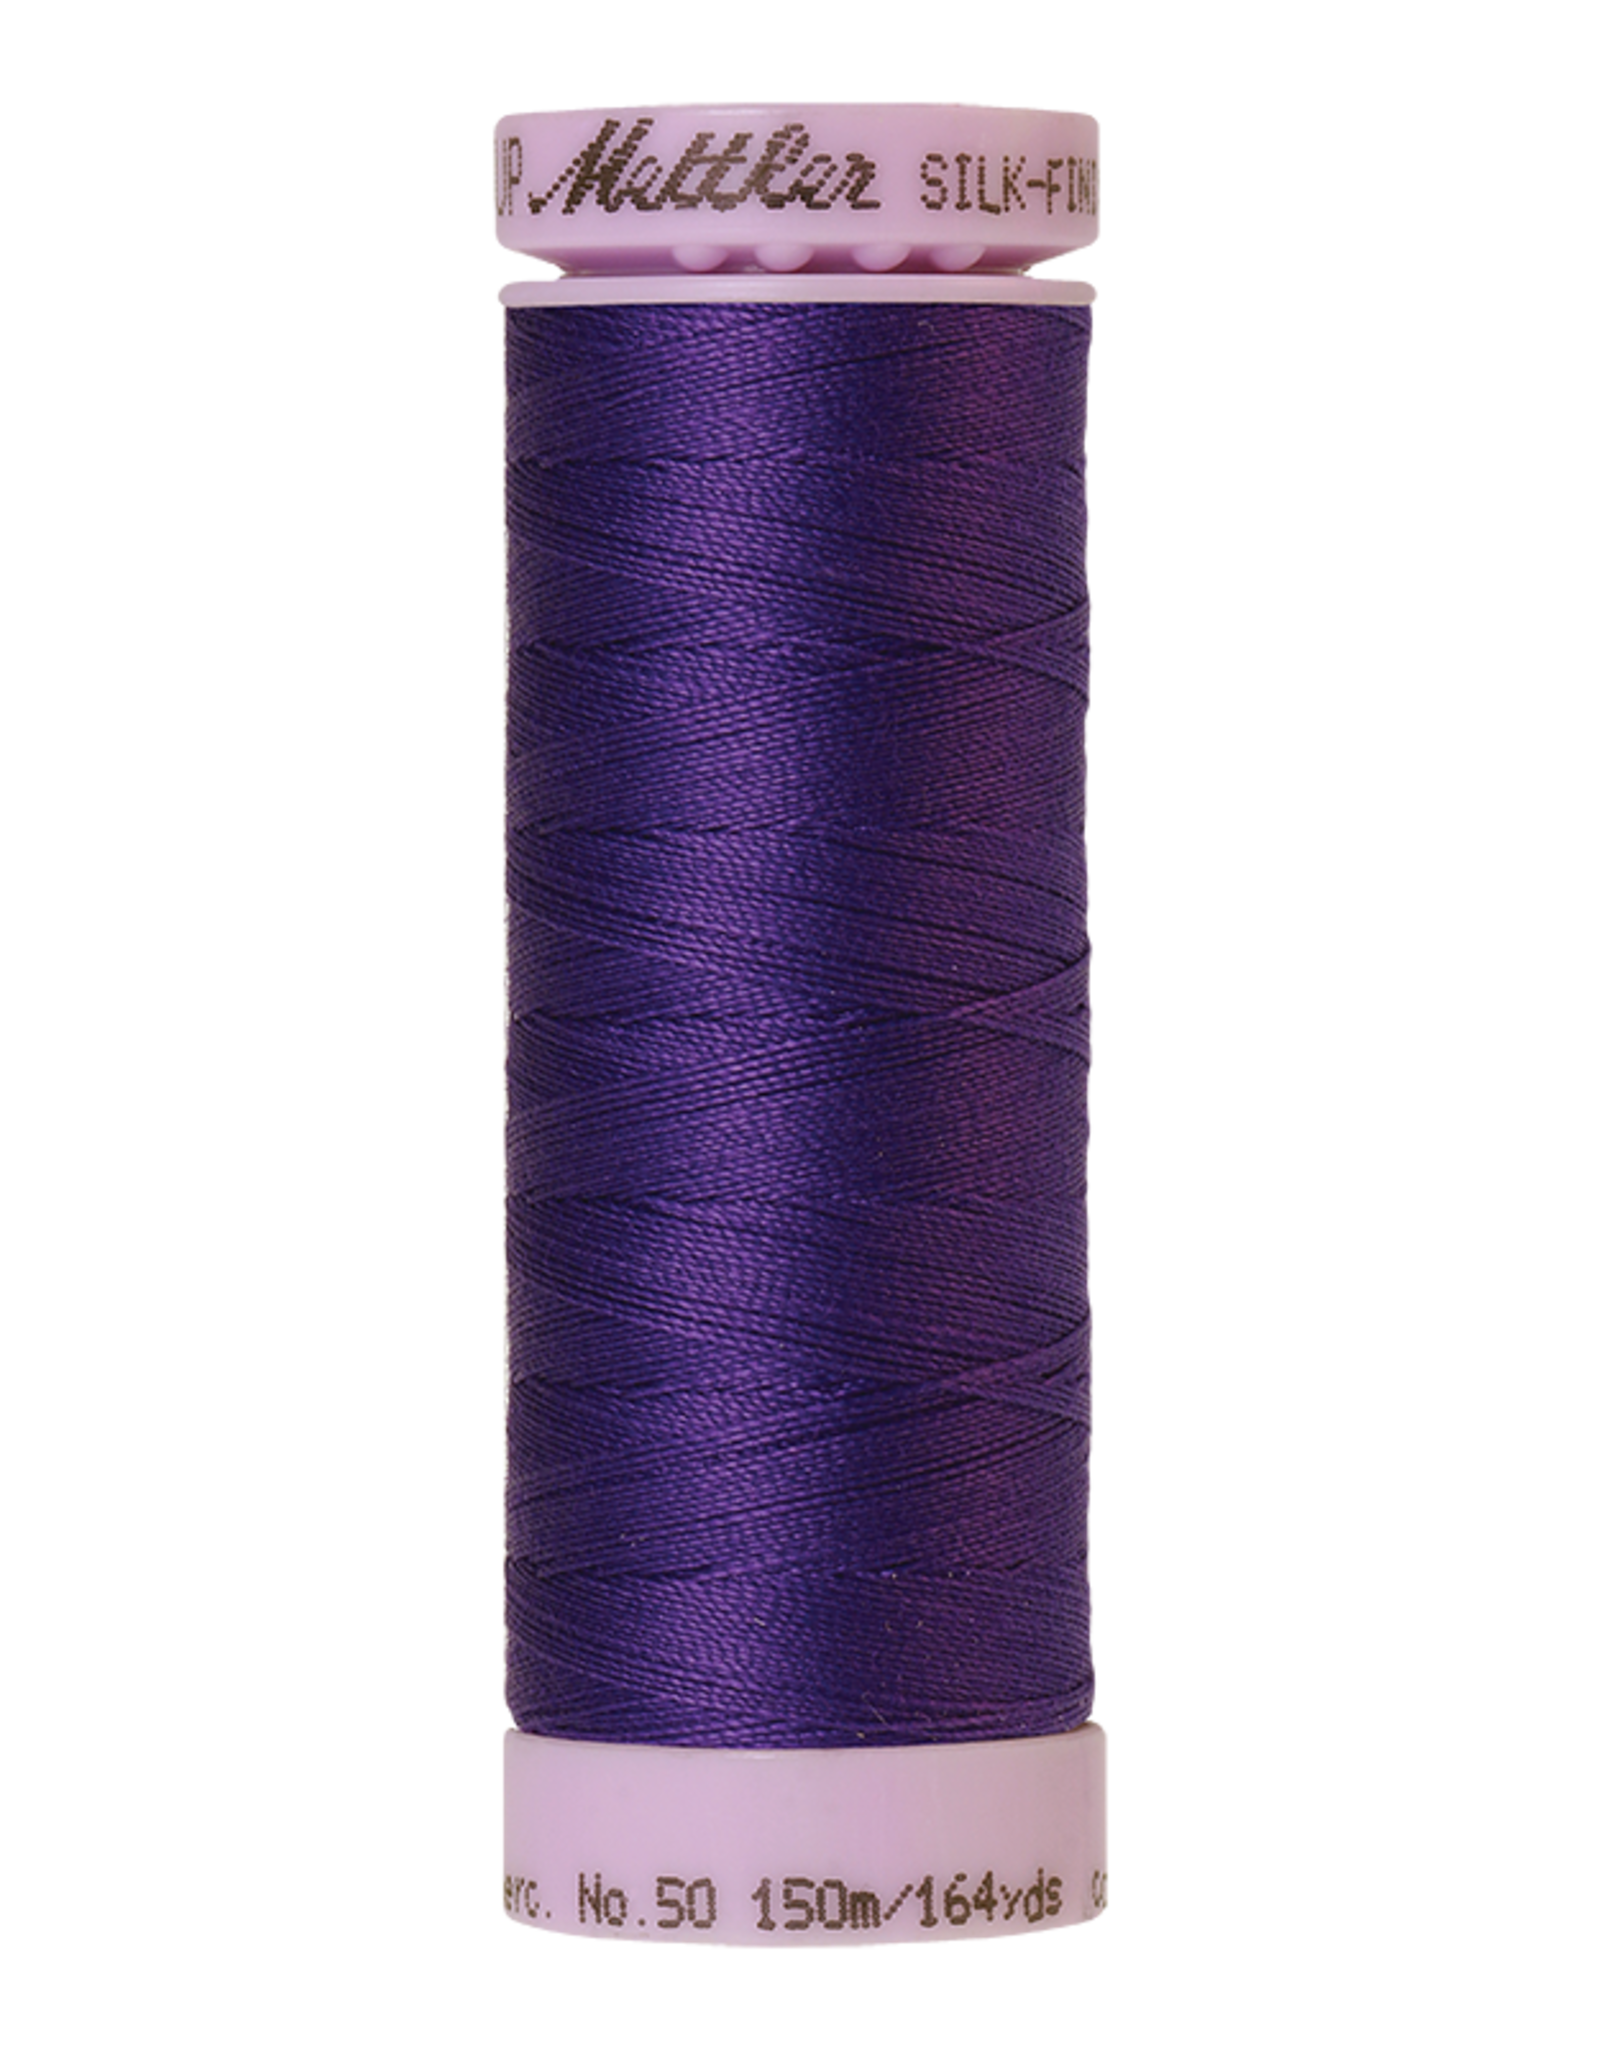 Mettler Silk Finish Cotton 50 - 150 meter - 0030